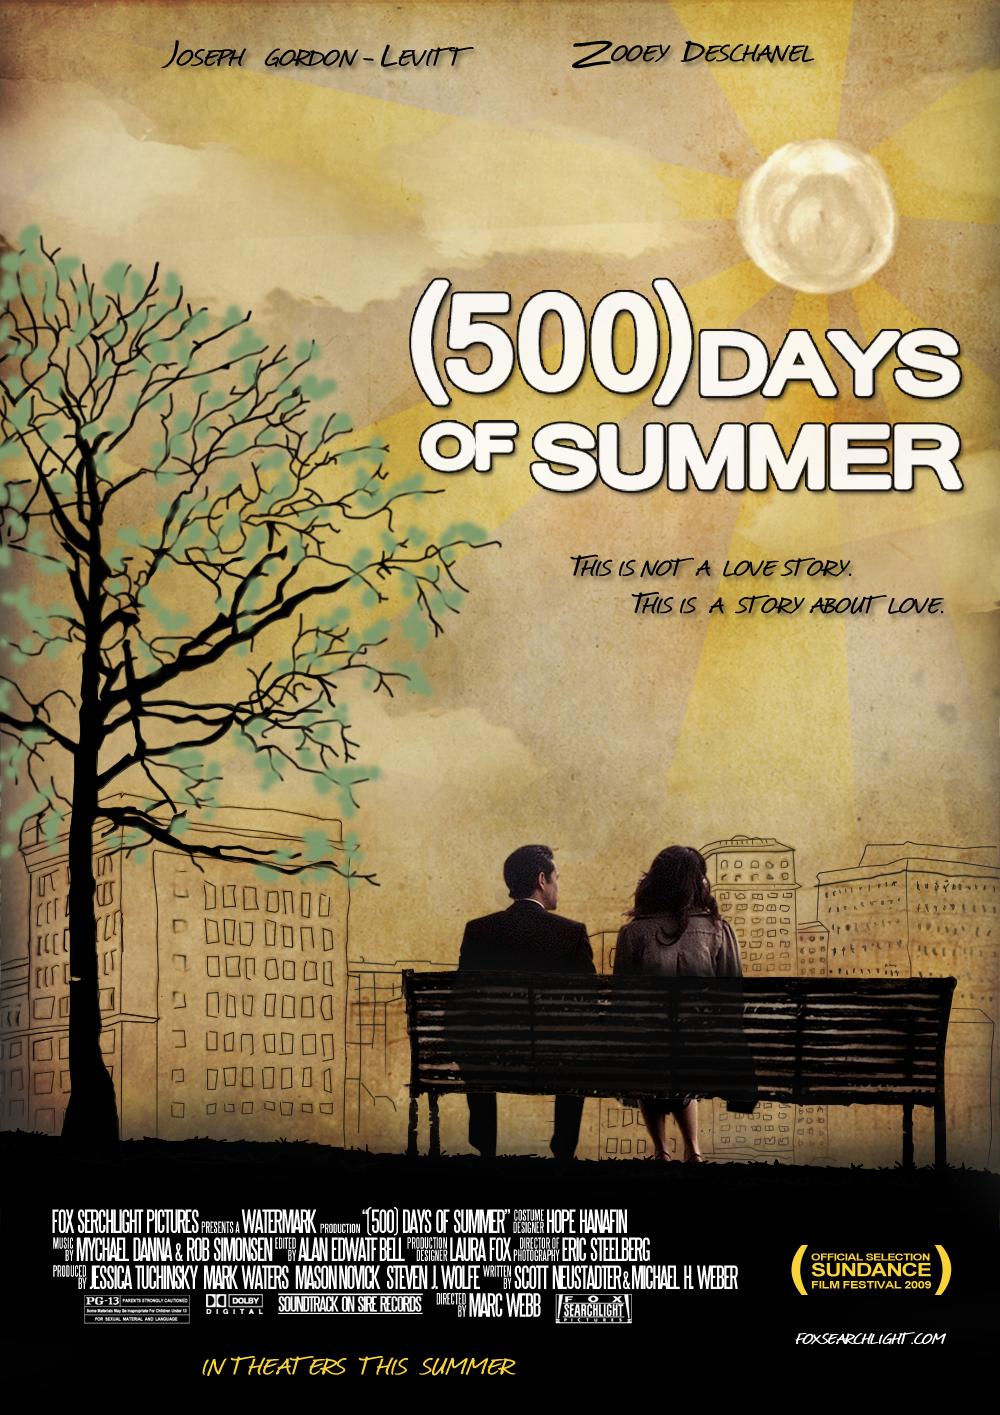 500 days of summer autumn ending a relationship